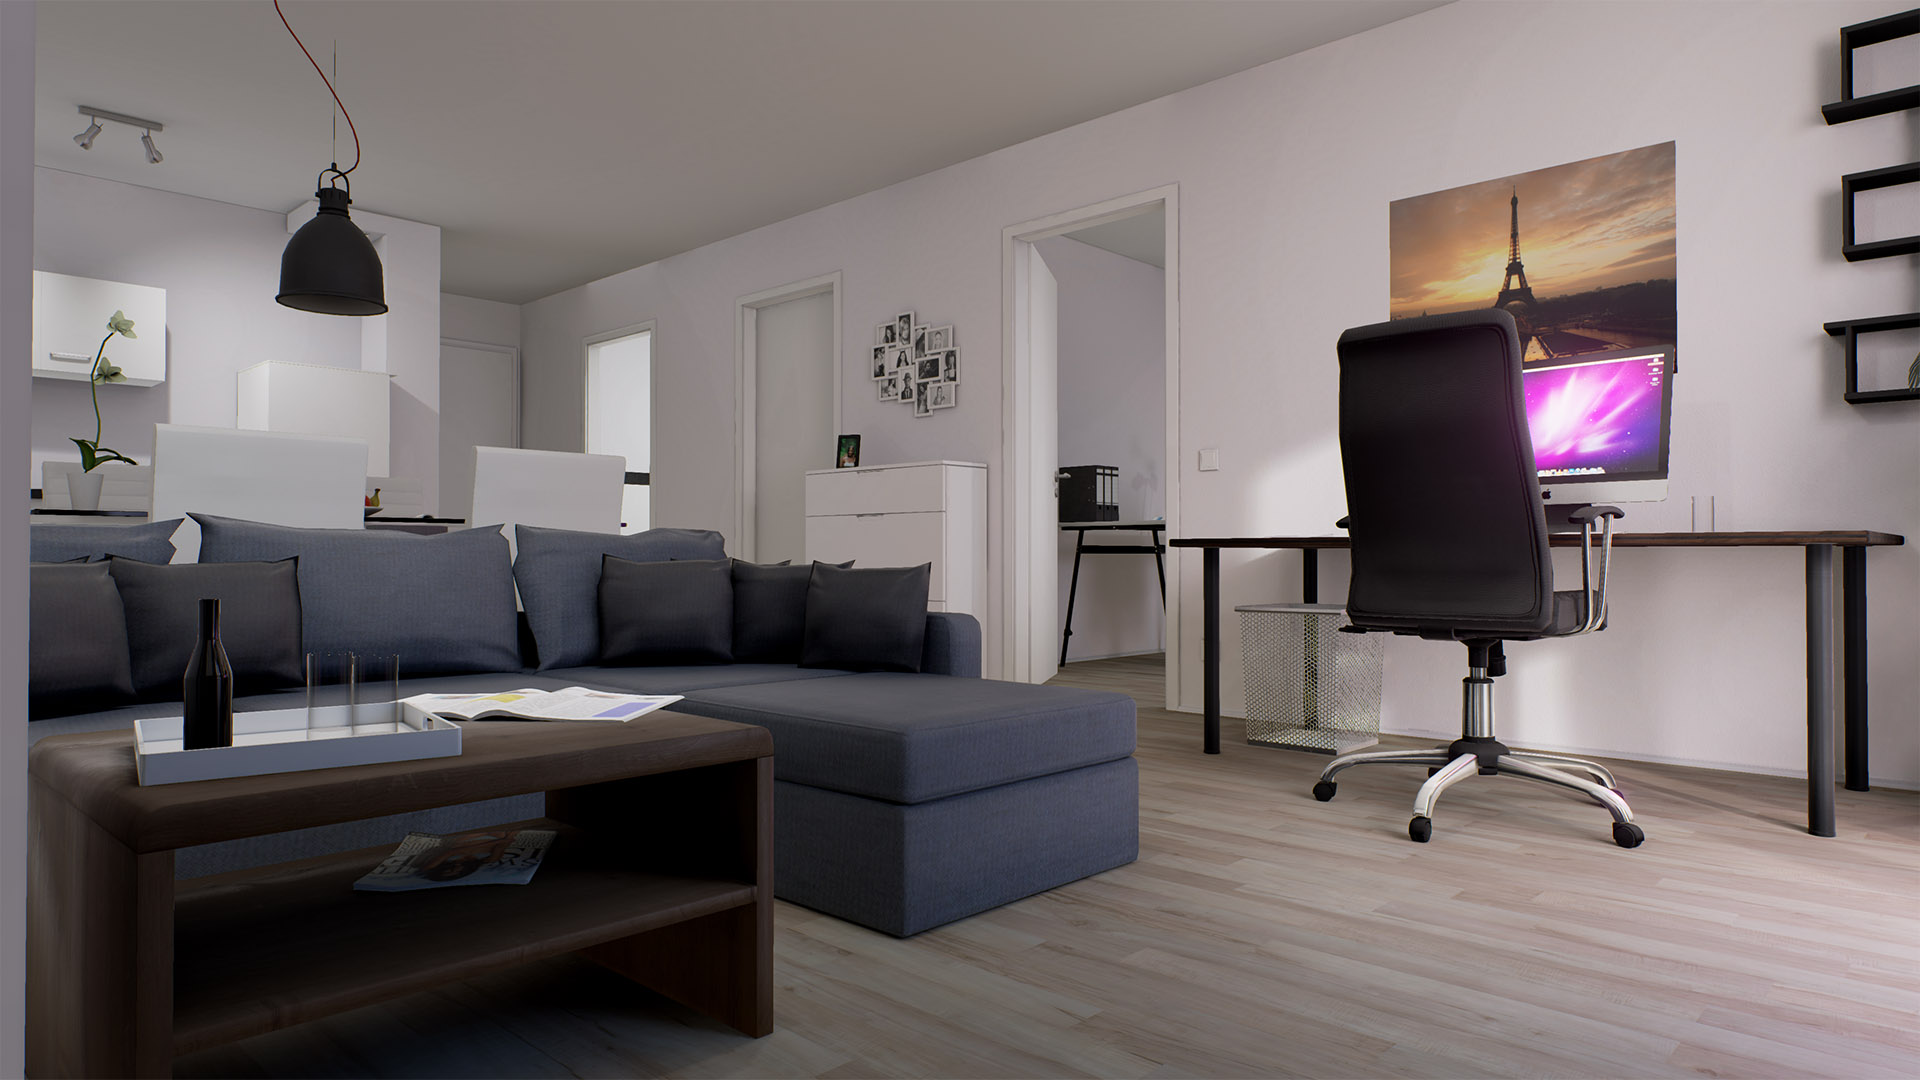 Threedee modern flat interior by threedee gmbh in for Modern flat interior